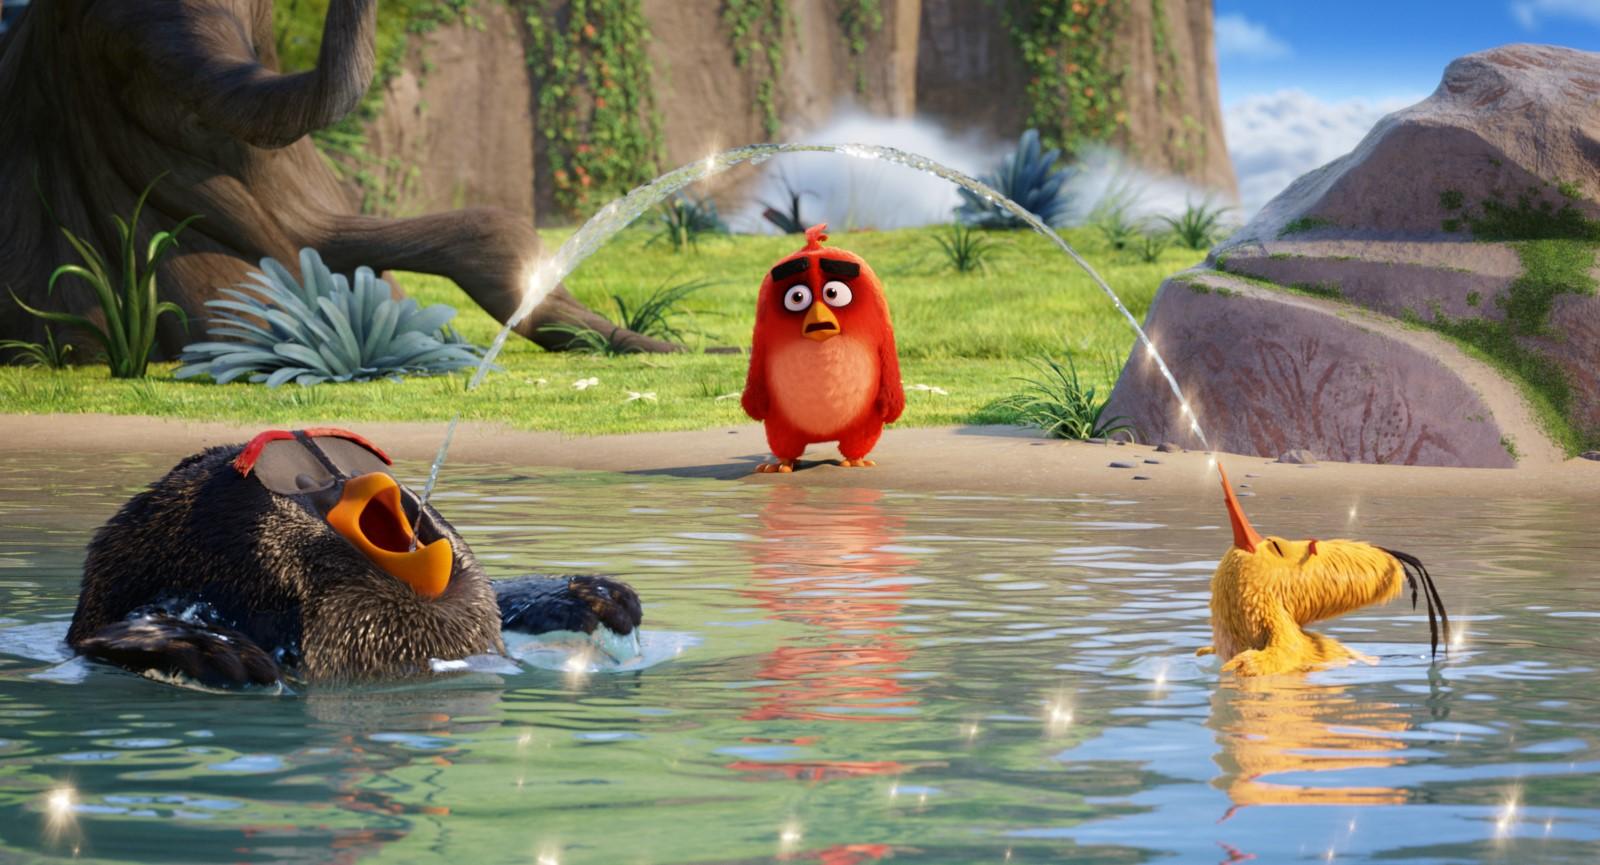 Angry-Birds-Film-Image-2